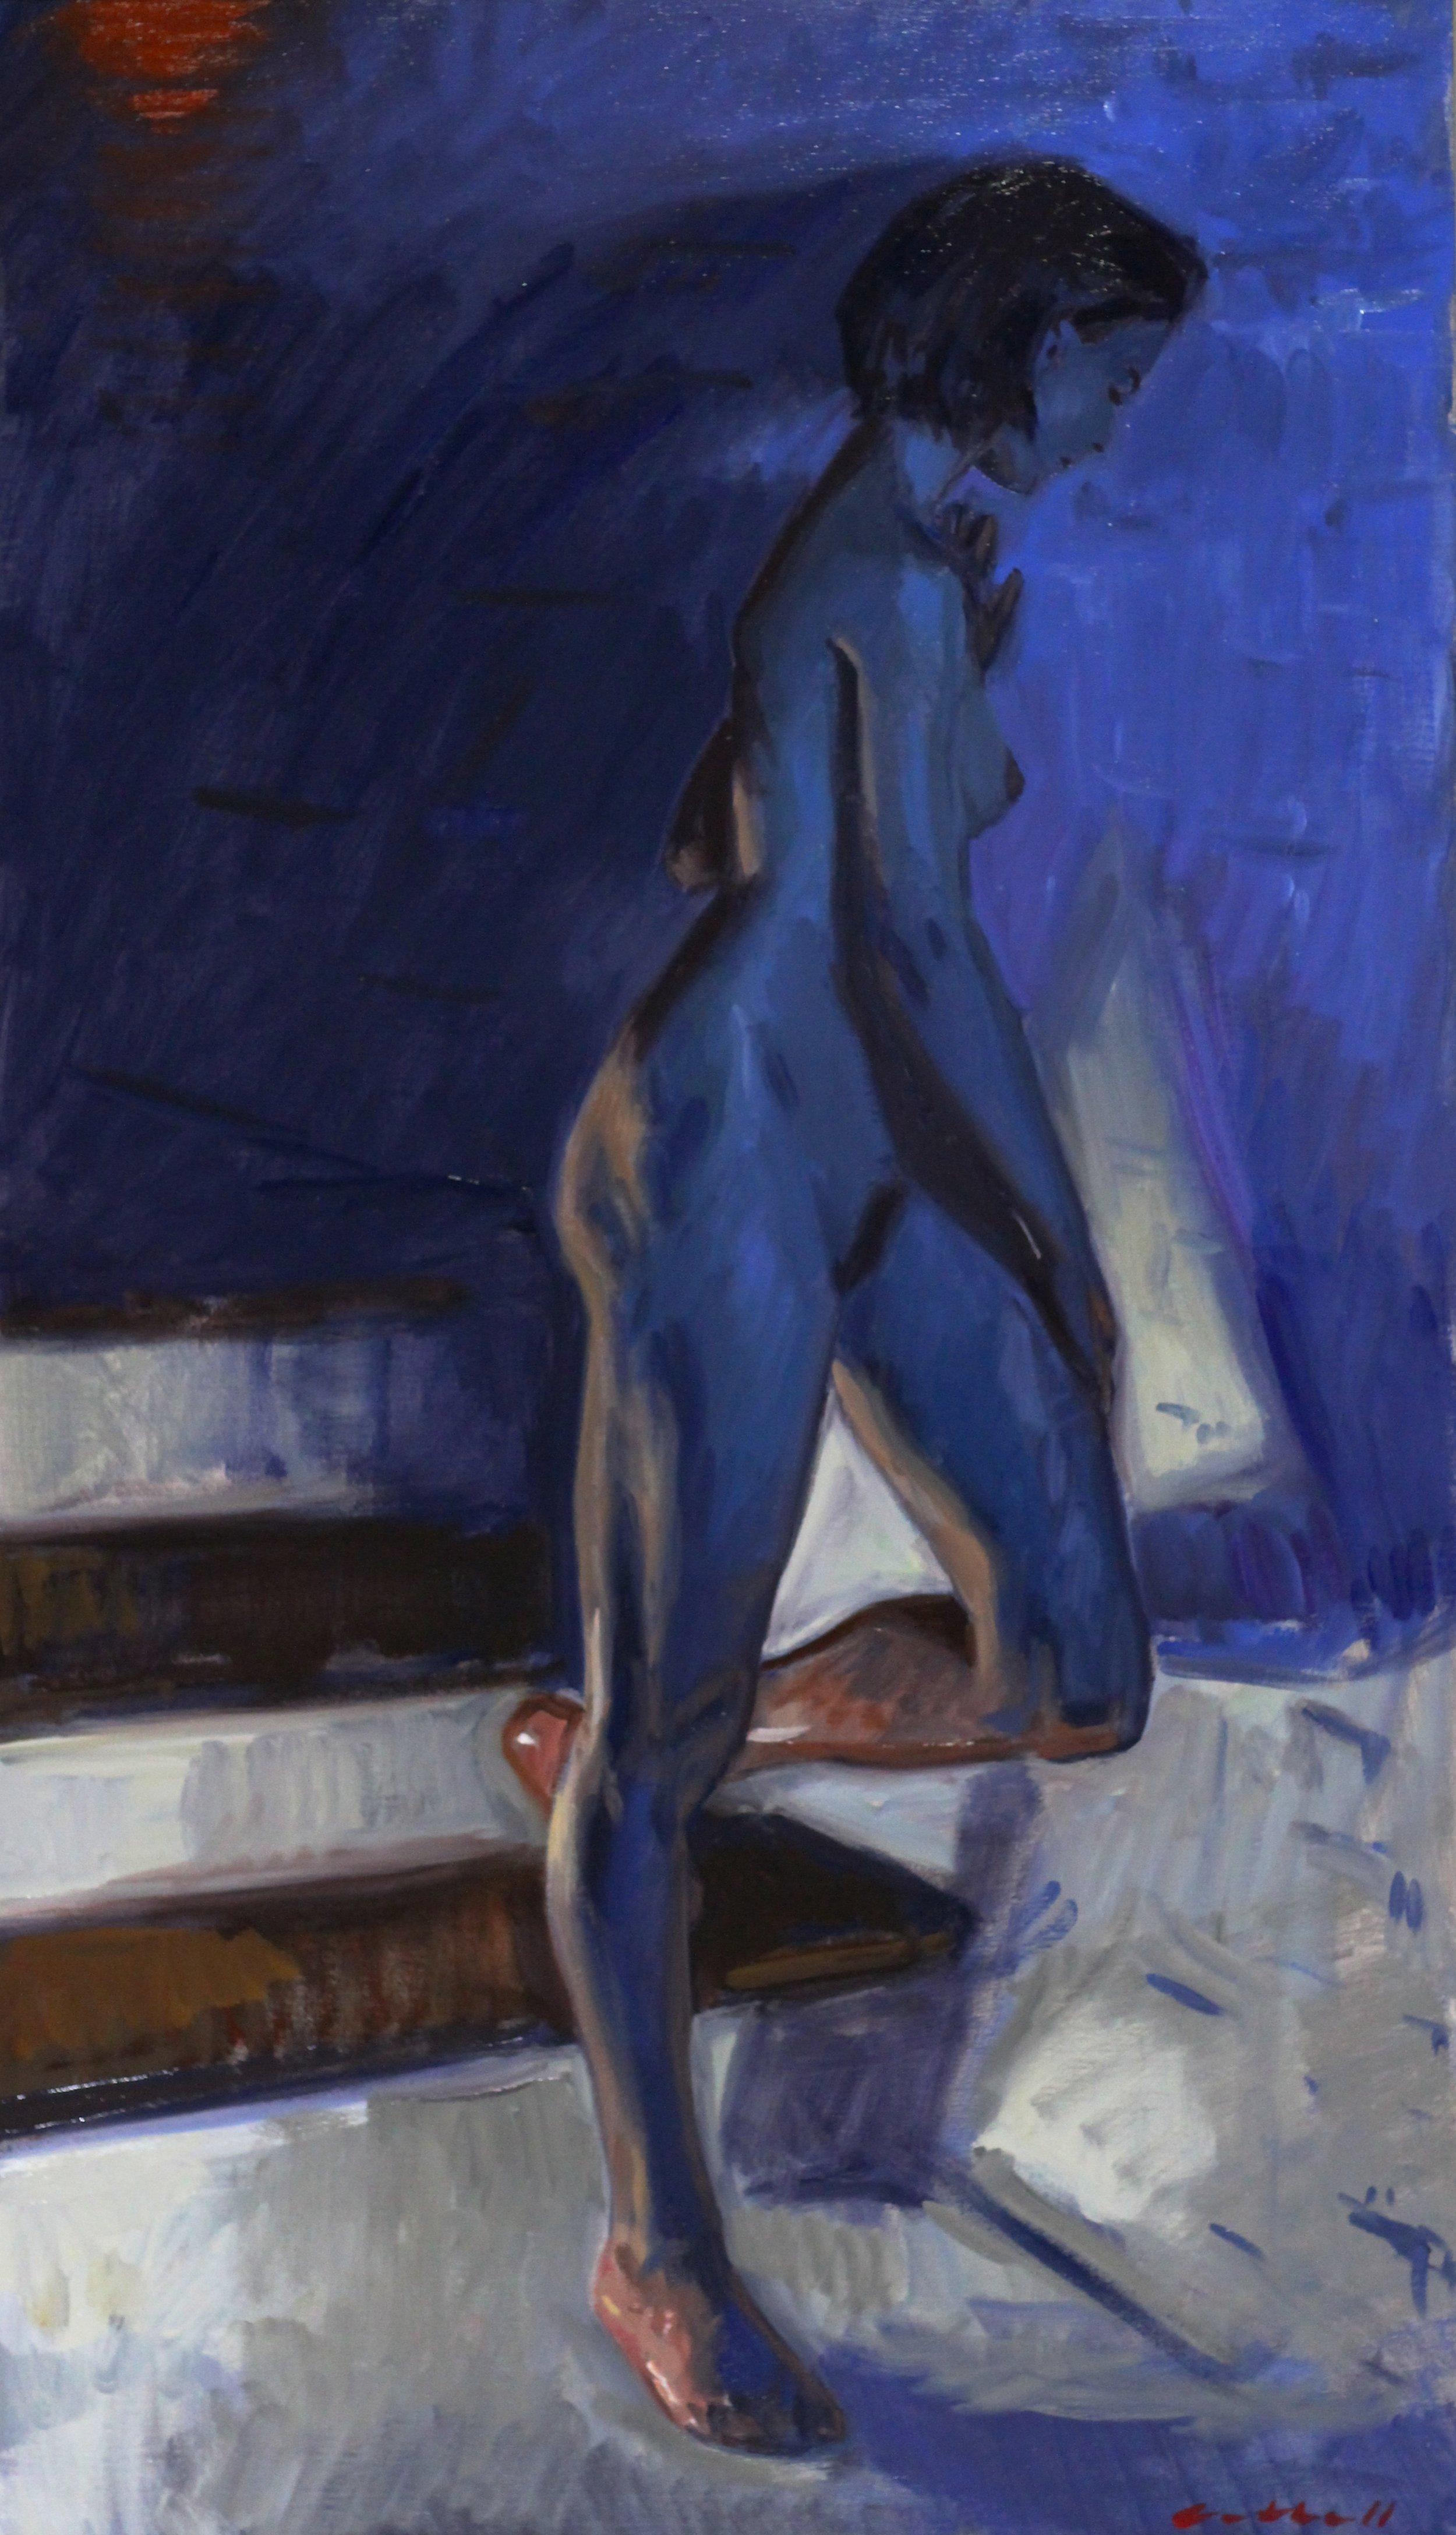 Chiara, Oil on Canvas, 105 x 60cm, 2017